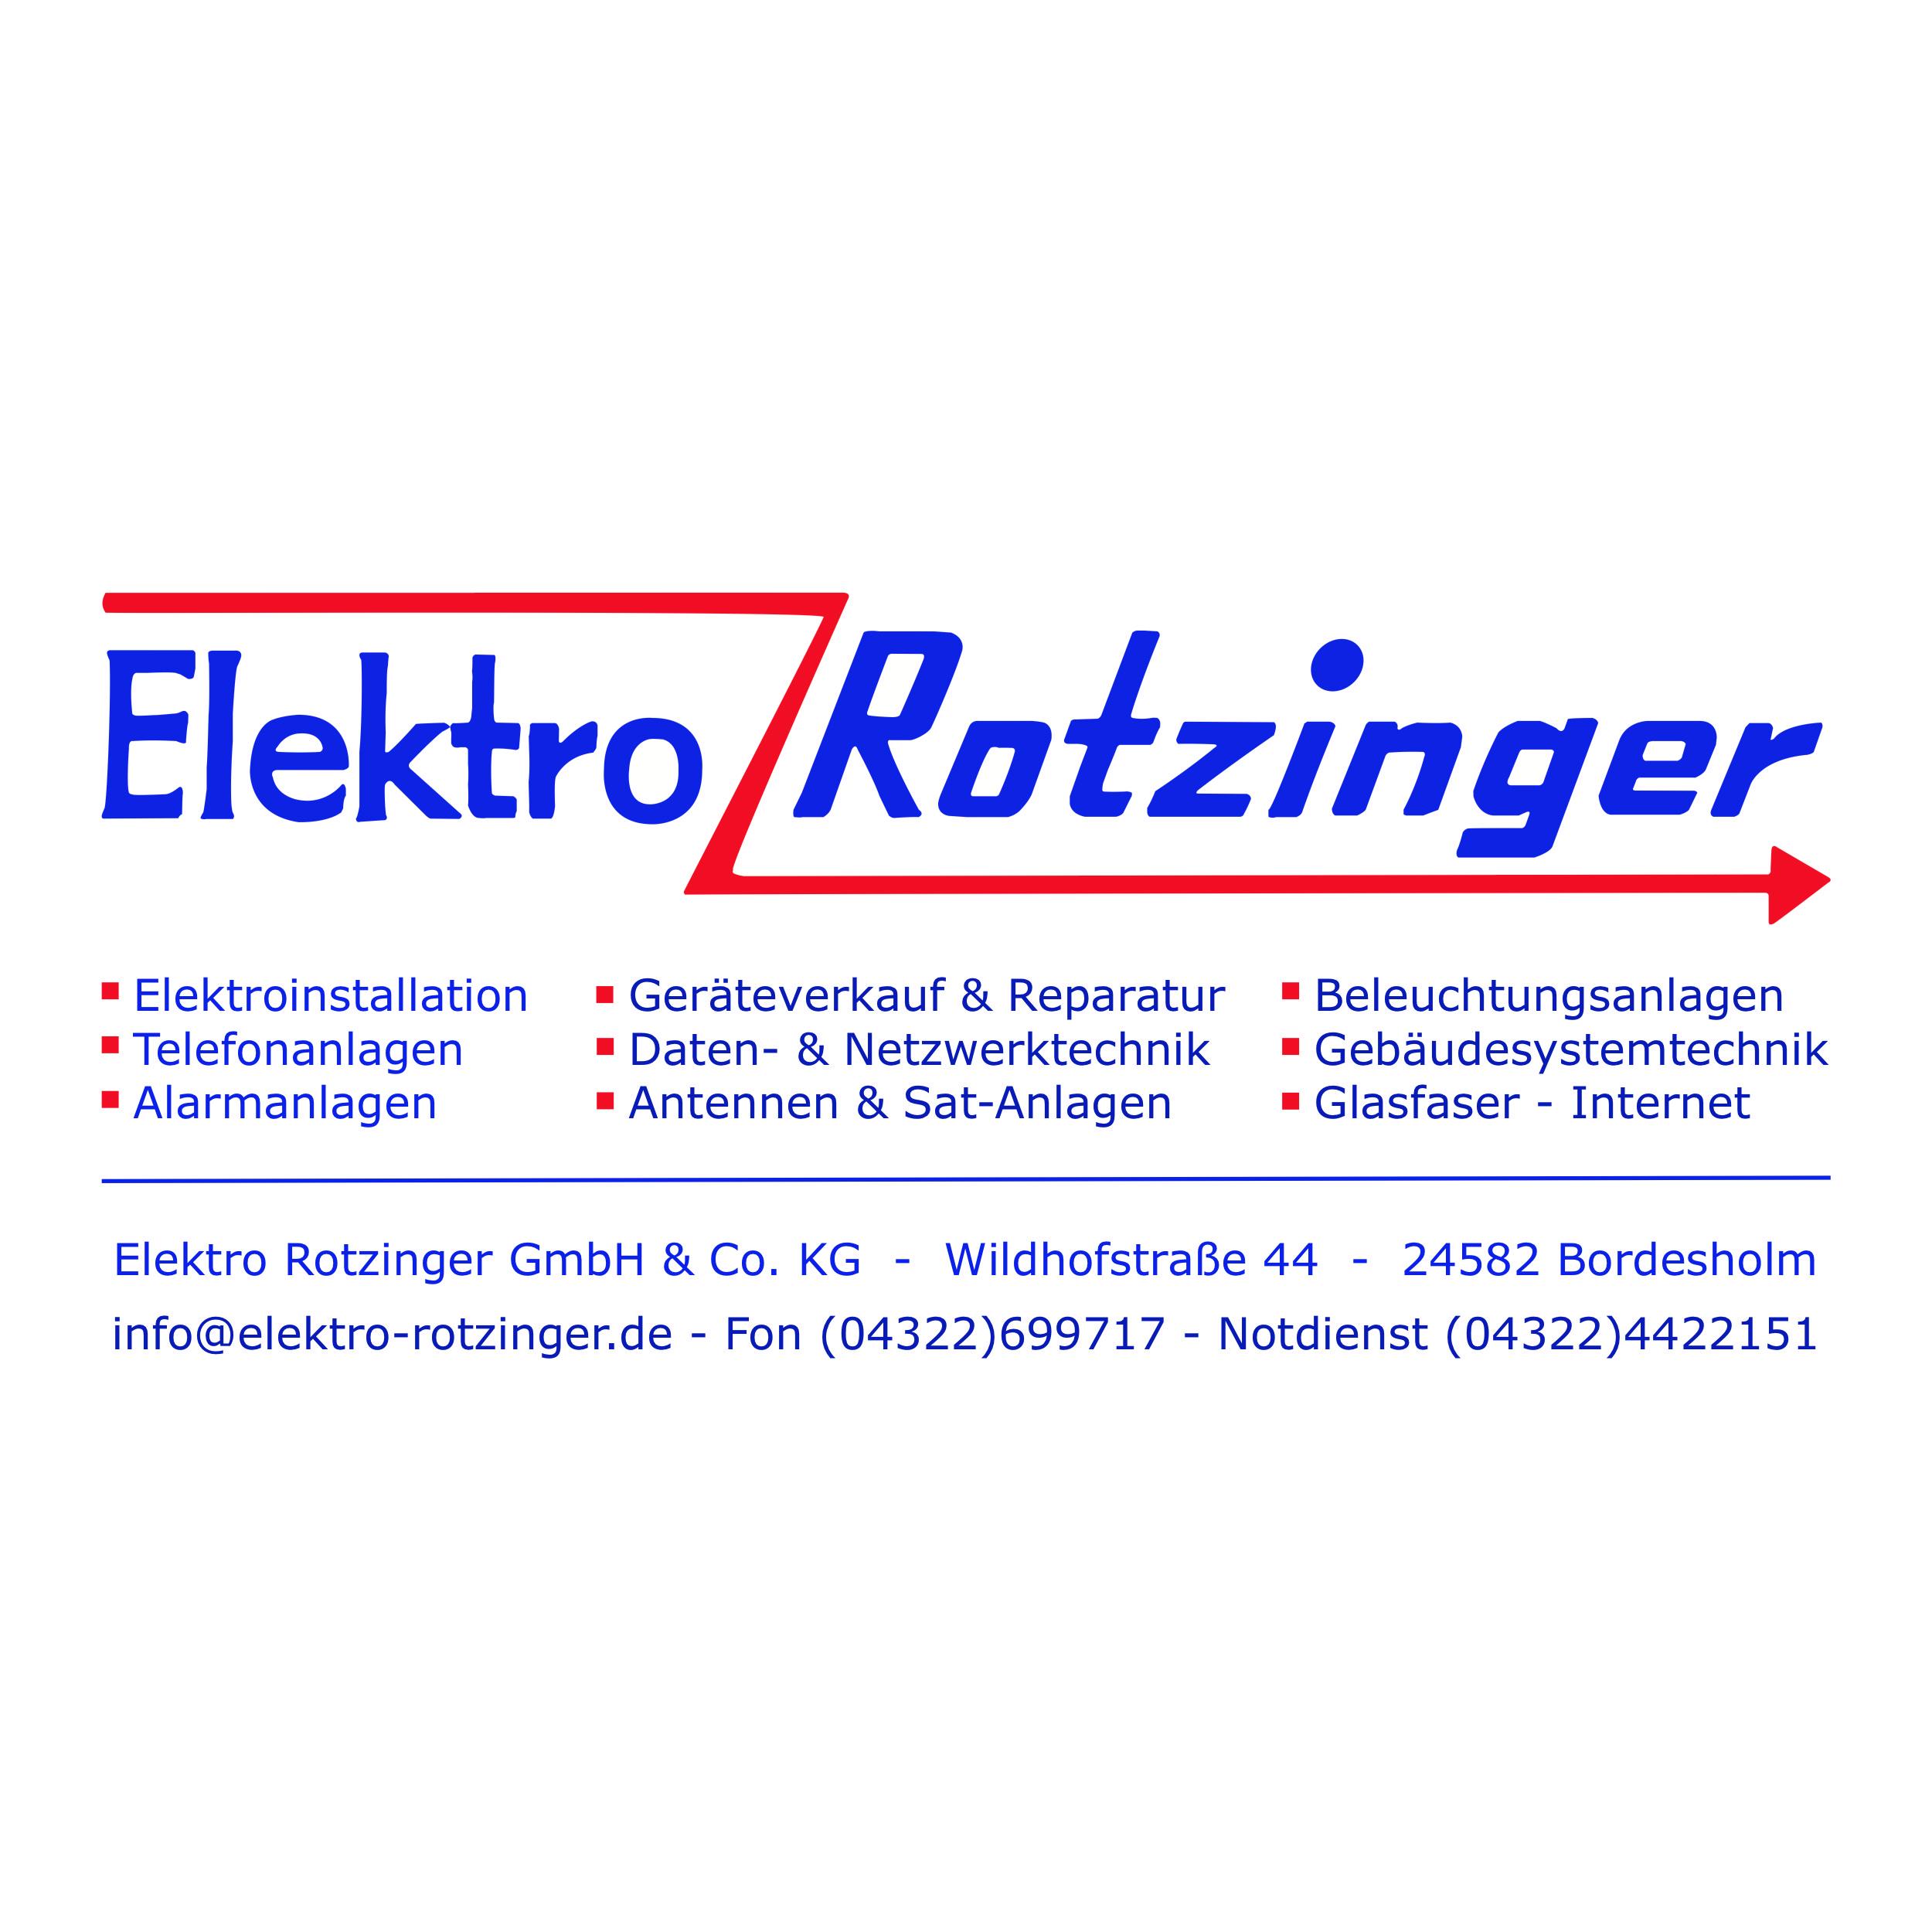 Elektro Rotzinger GmbH & Co. KG